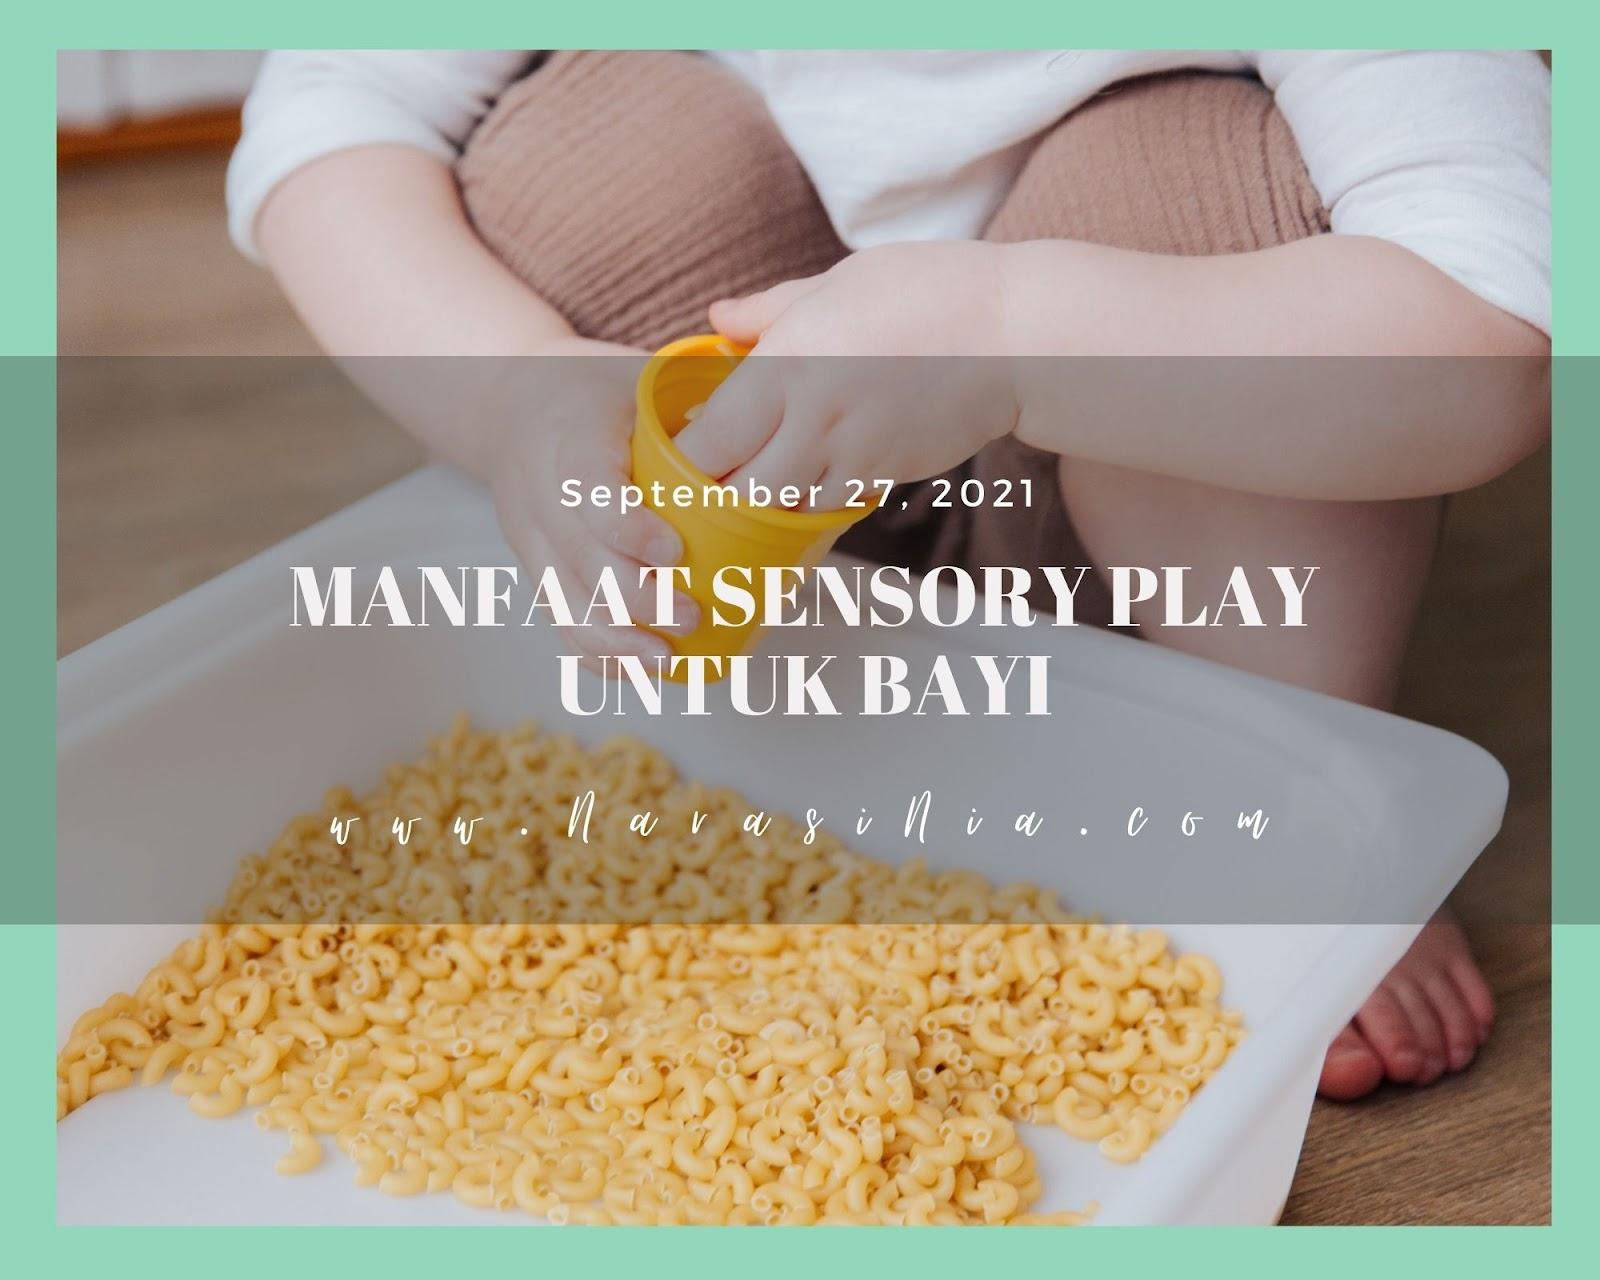 manfaat sensory play untuk bayi